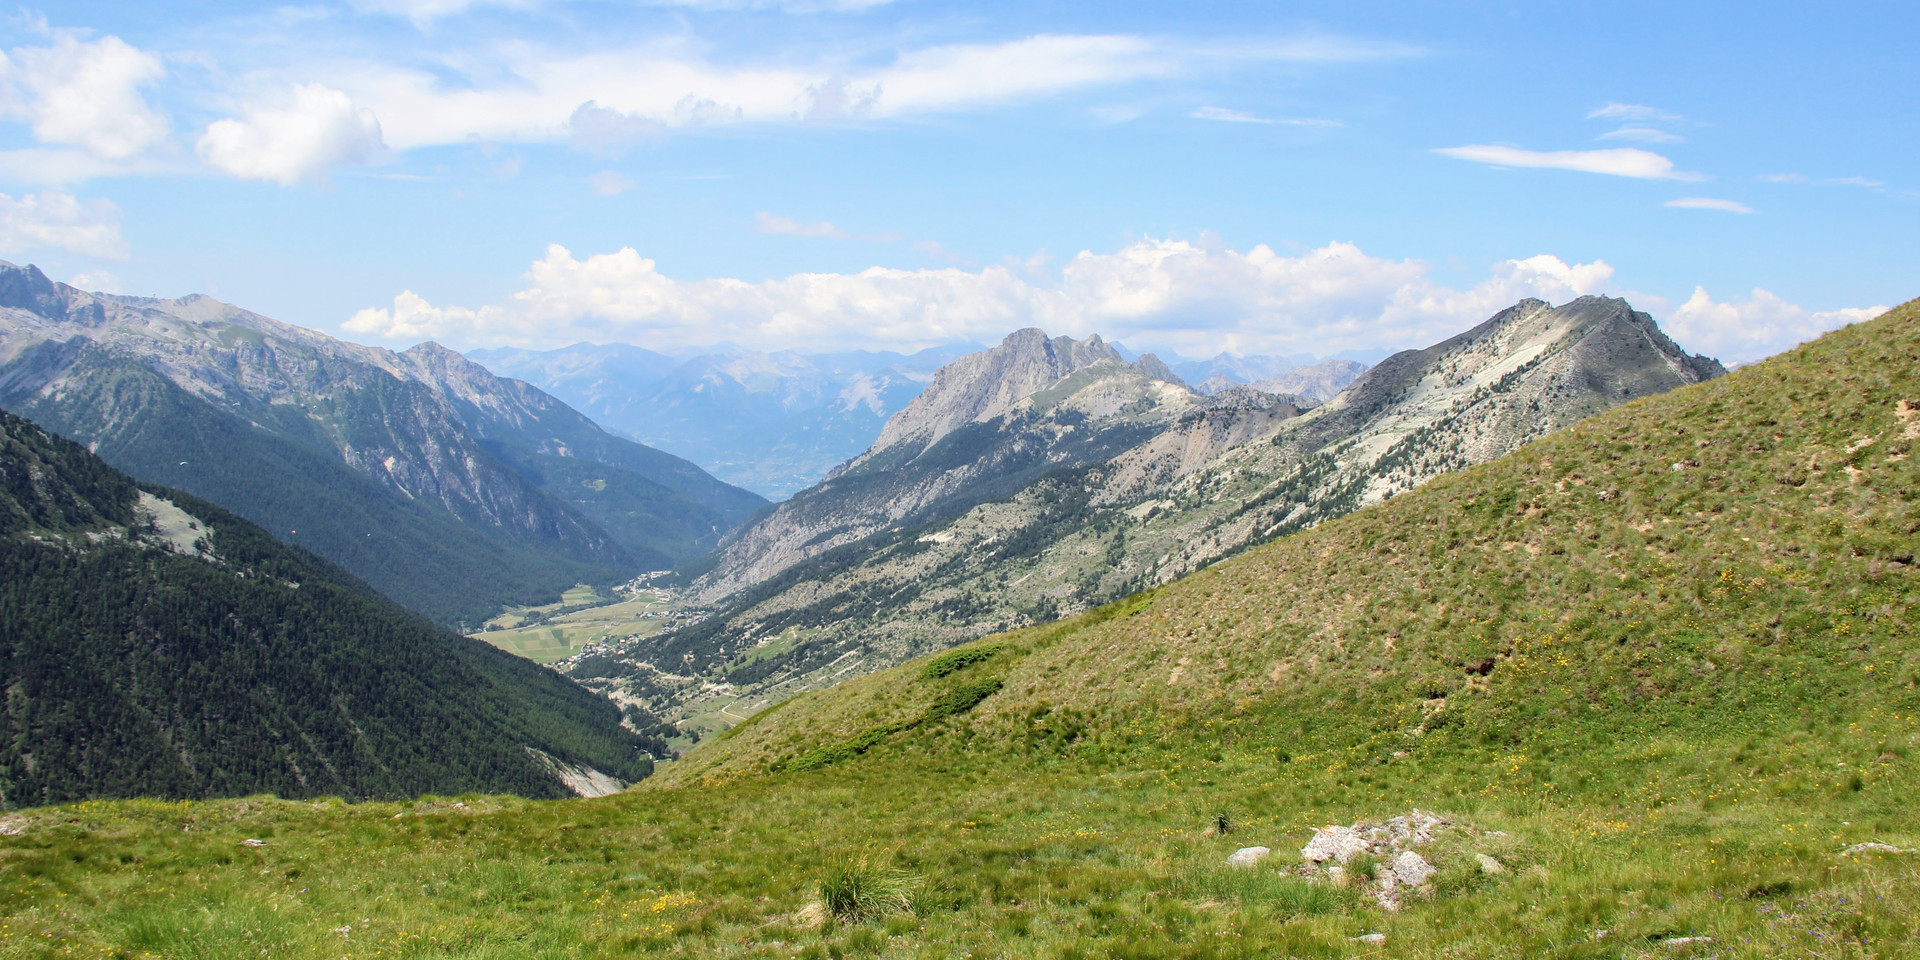 La vallée de Ceillac